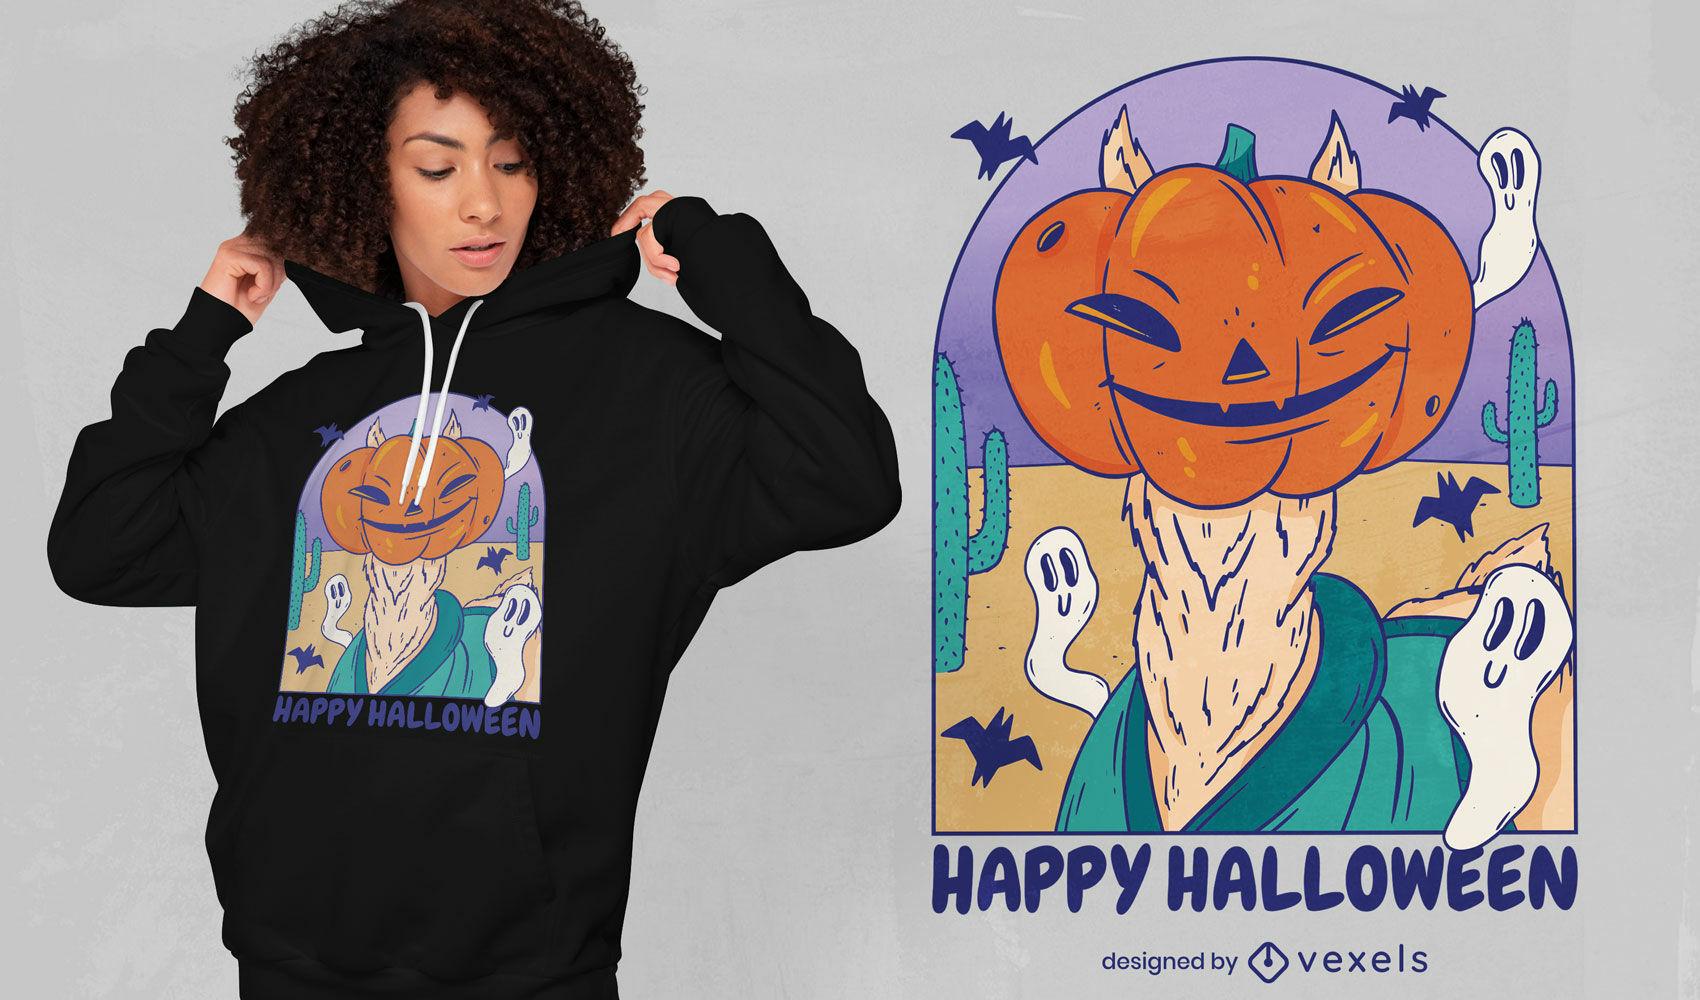 Cool Halloween alpaca t-shirt design